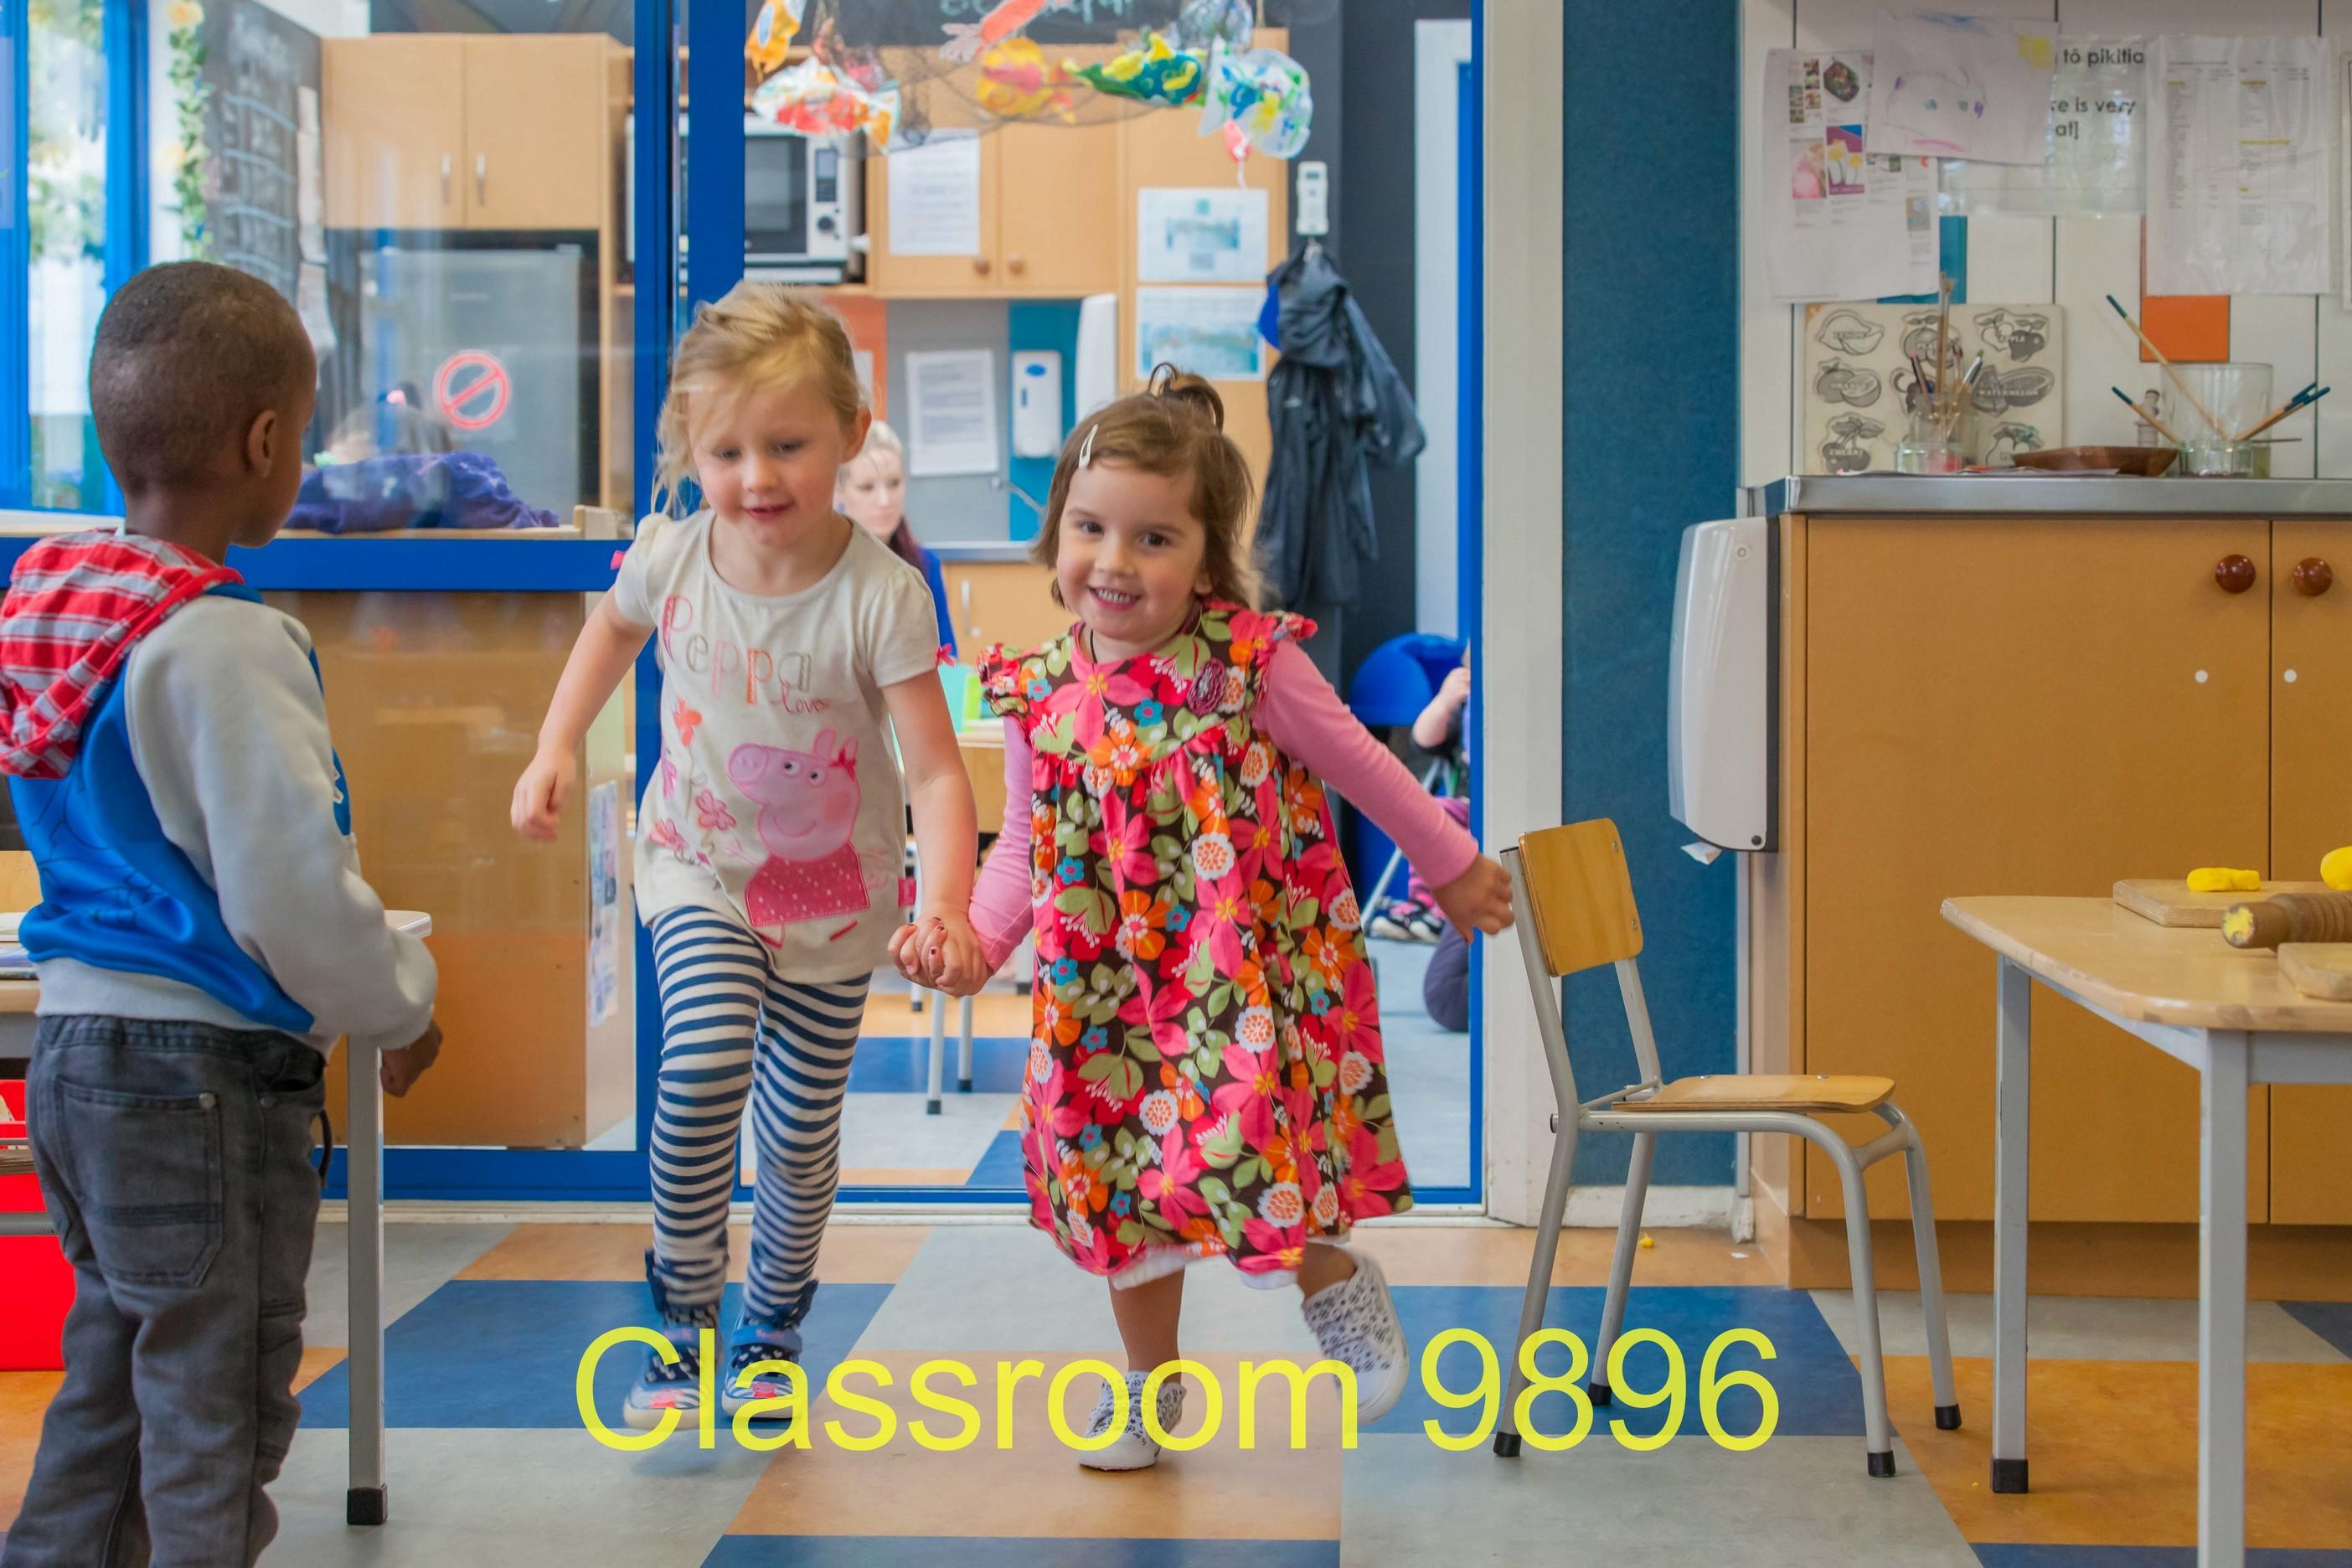 Classroom 9896